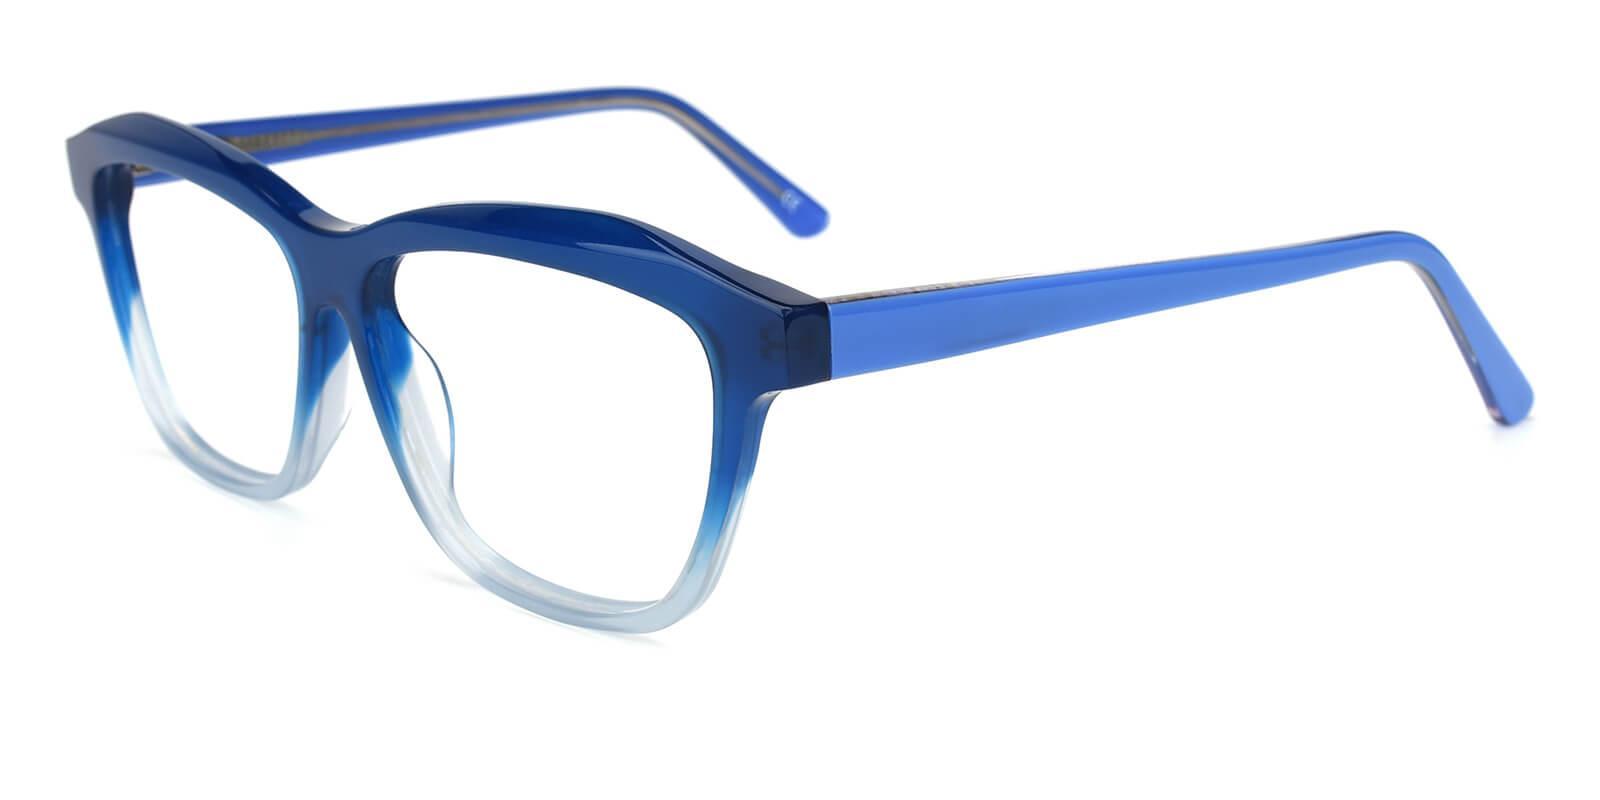 Gate-Blue-Square / Cat-Acetate-Eyeglasses-additional1